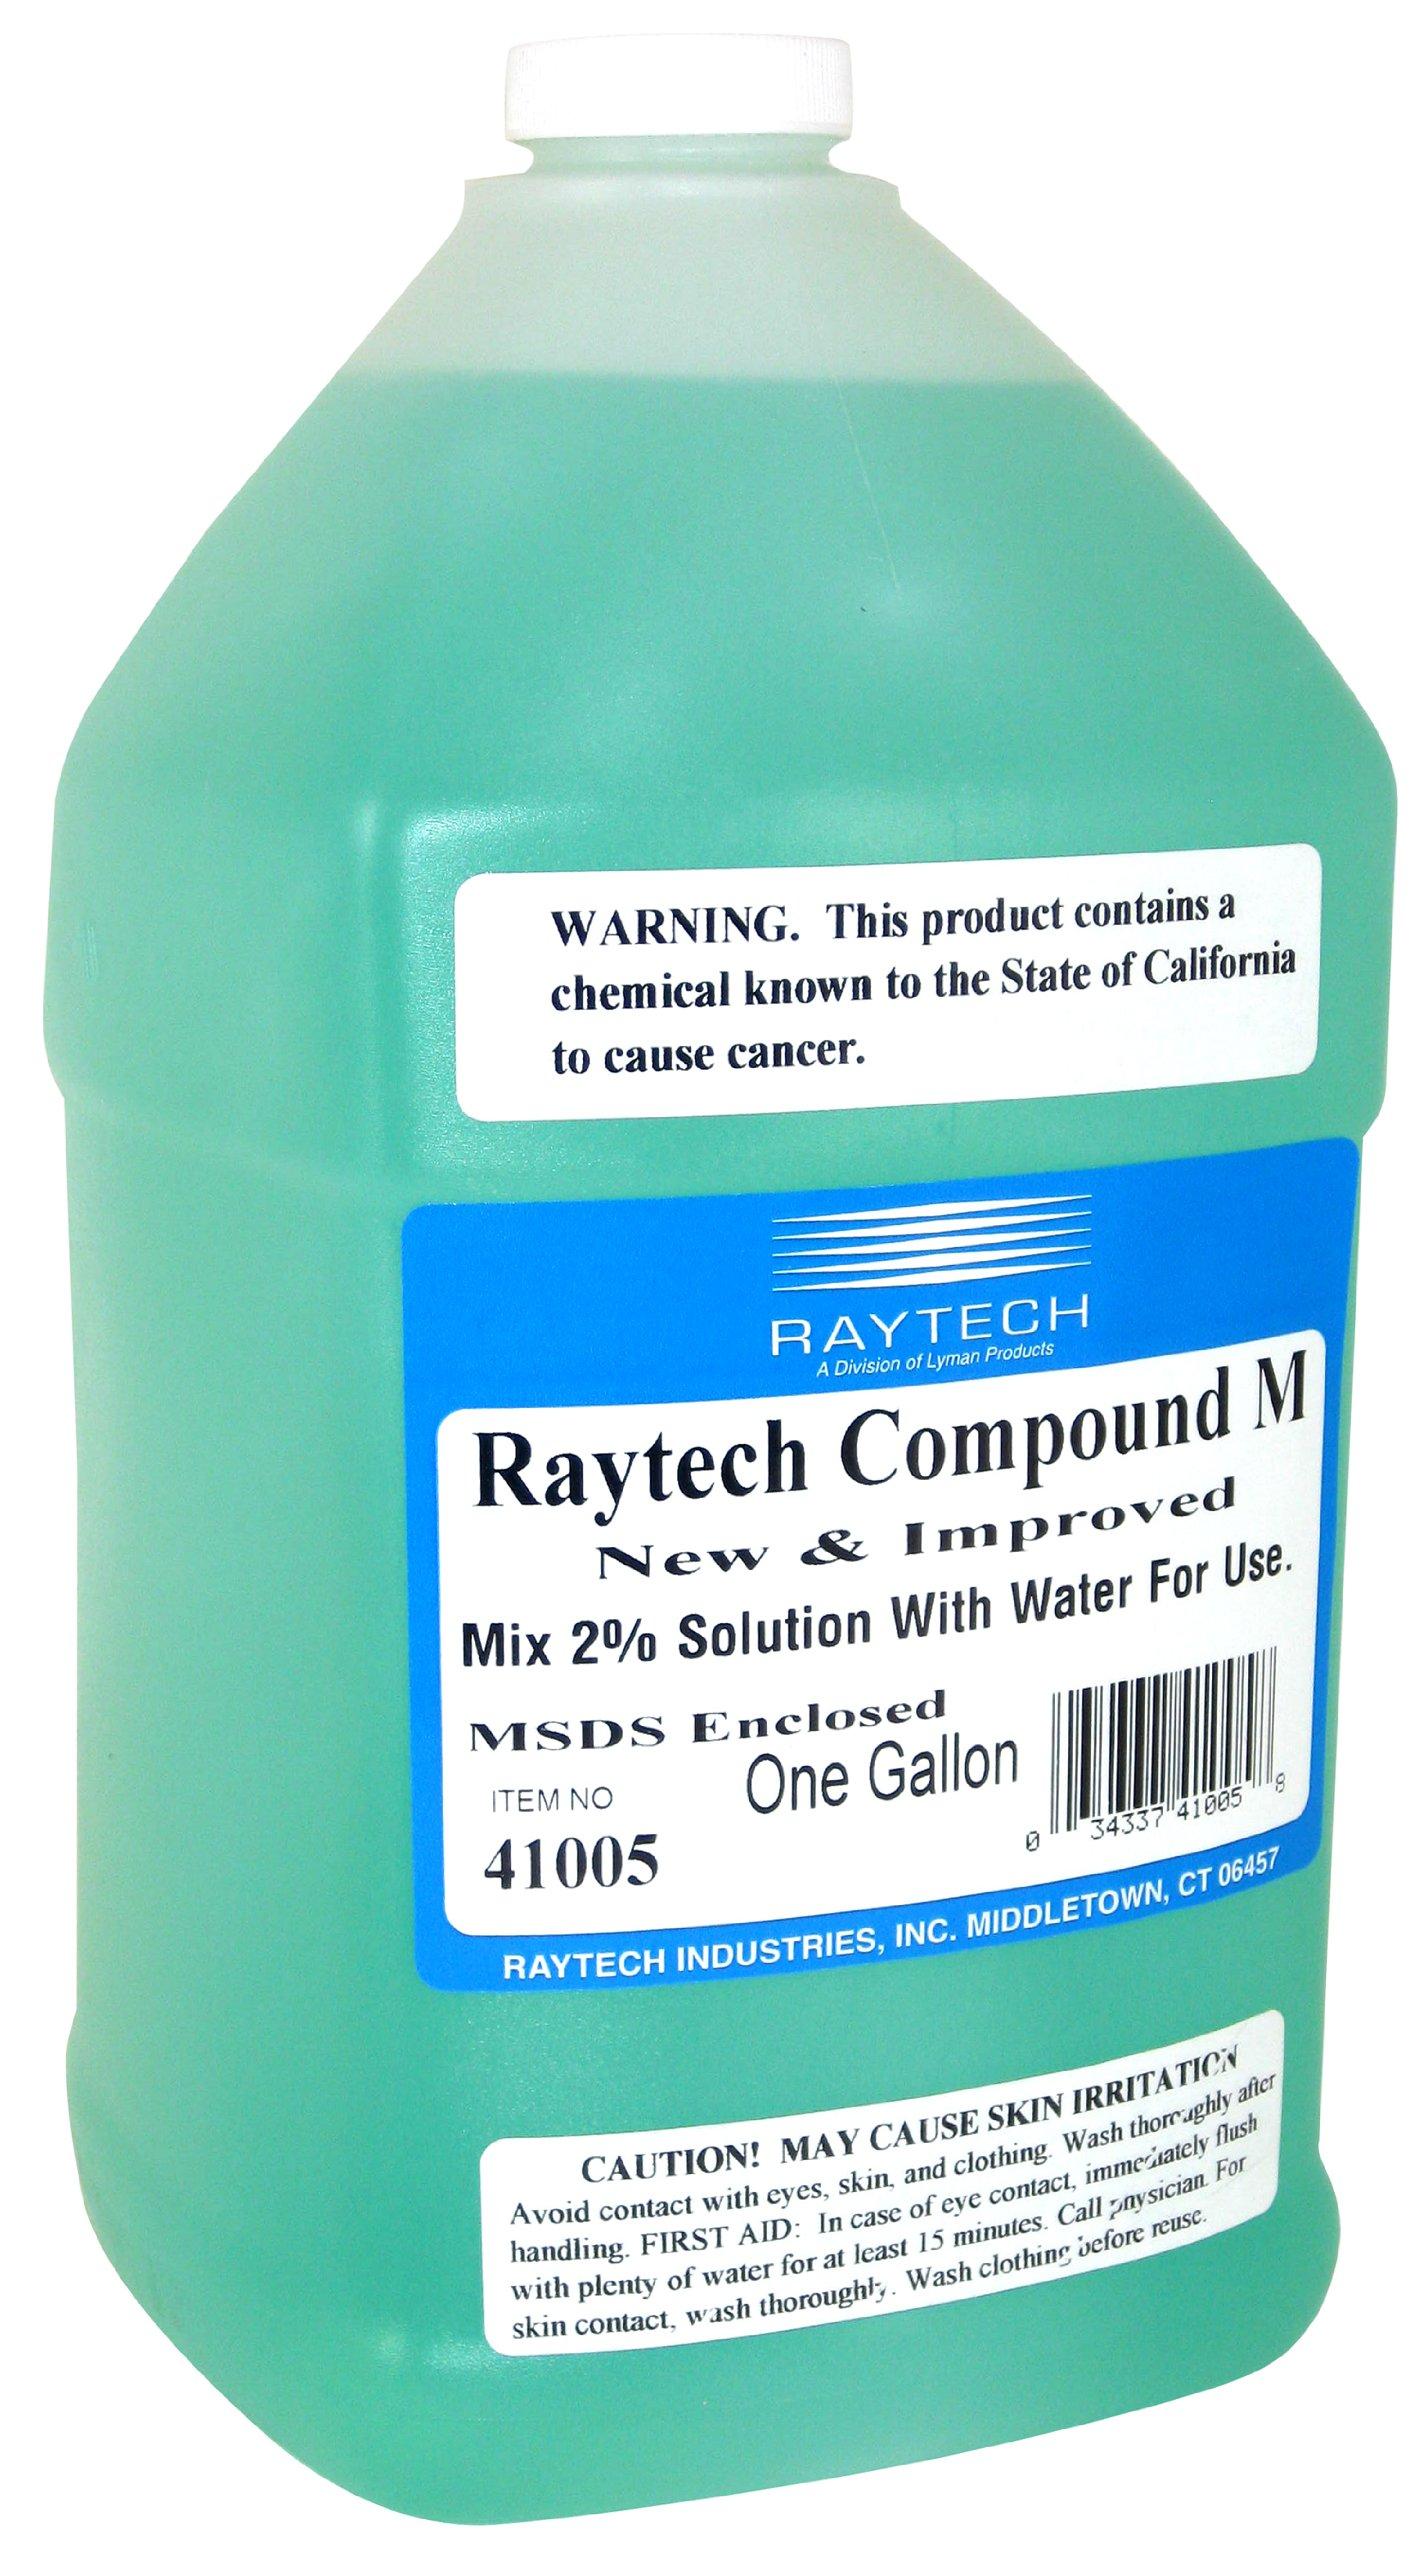 Raytech 41-005 M Compound, 1 Gallon Size